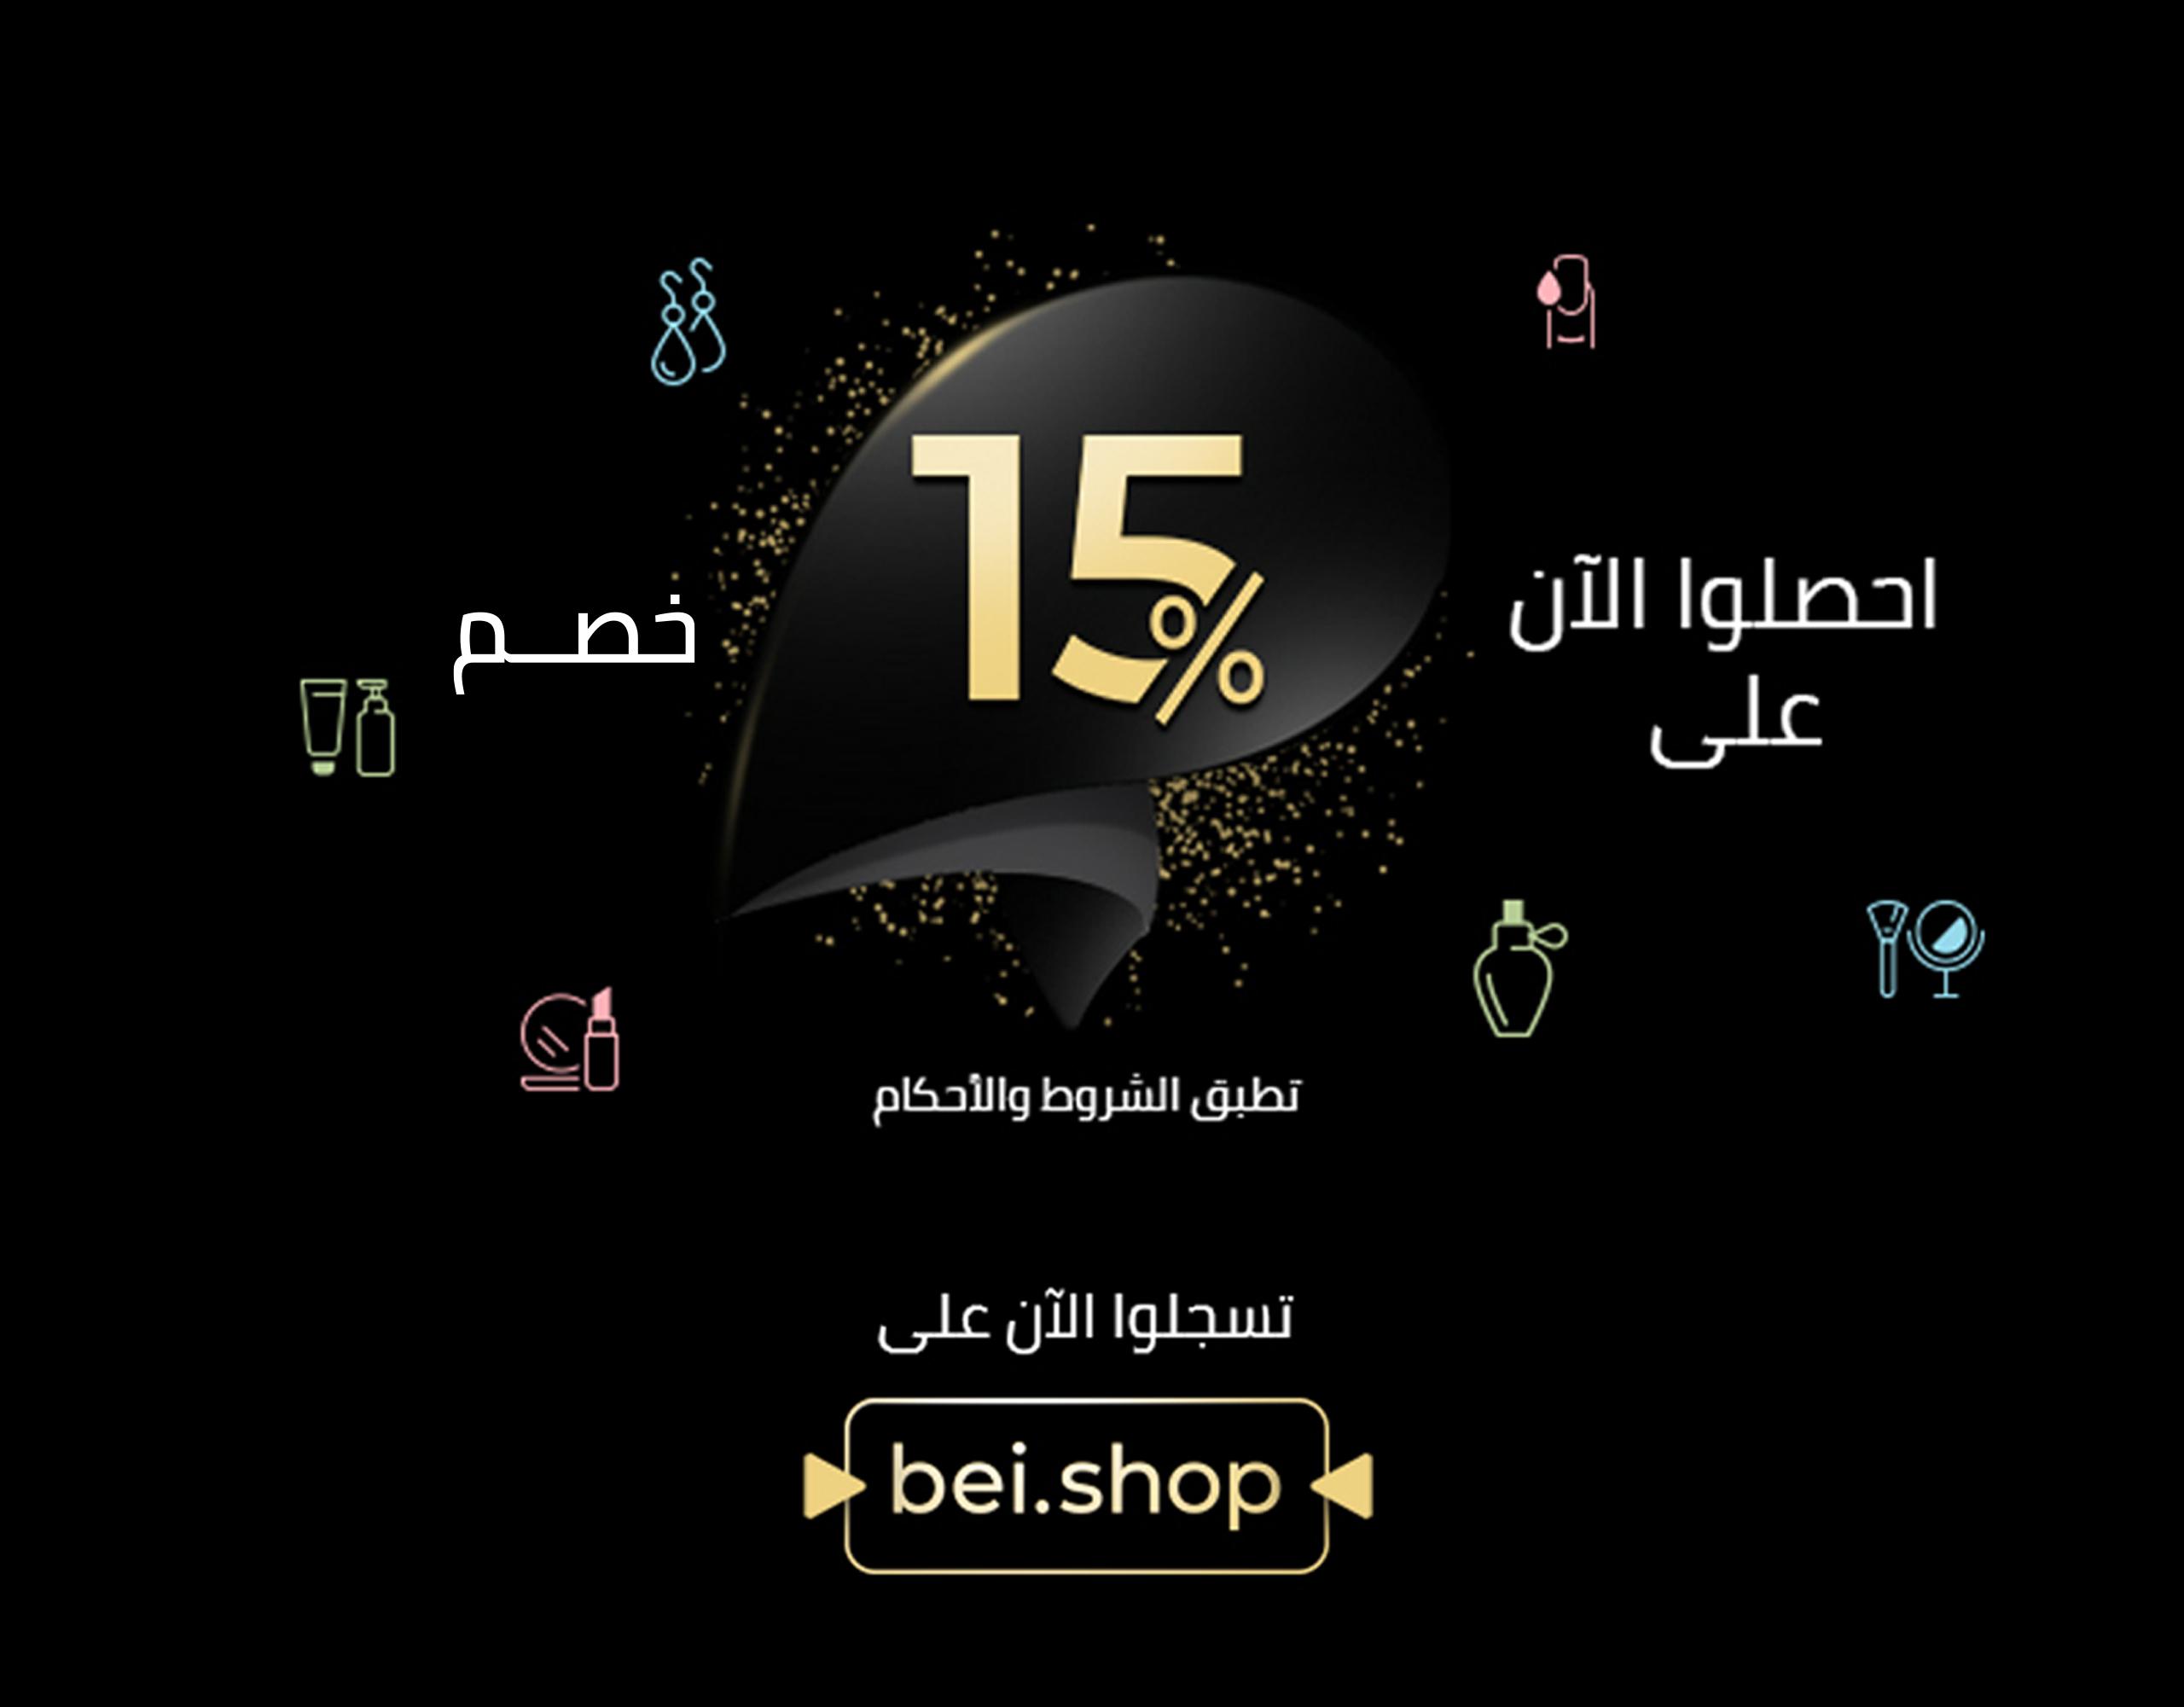 Bei Website Banner 2560x2001px 15% Arb